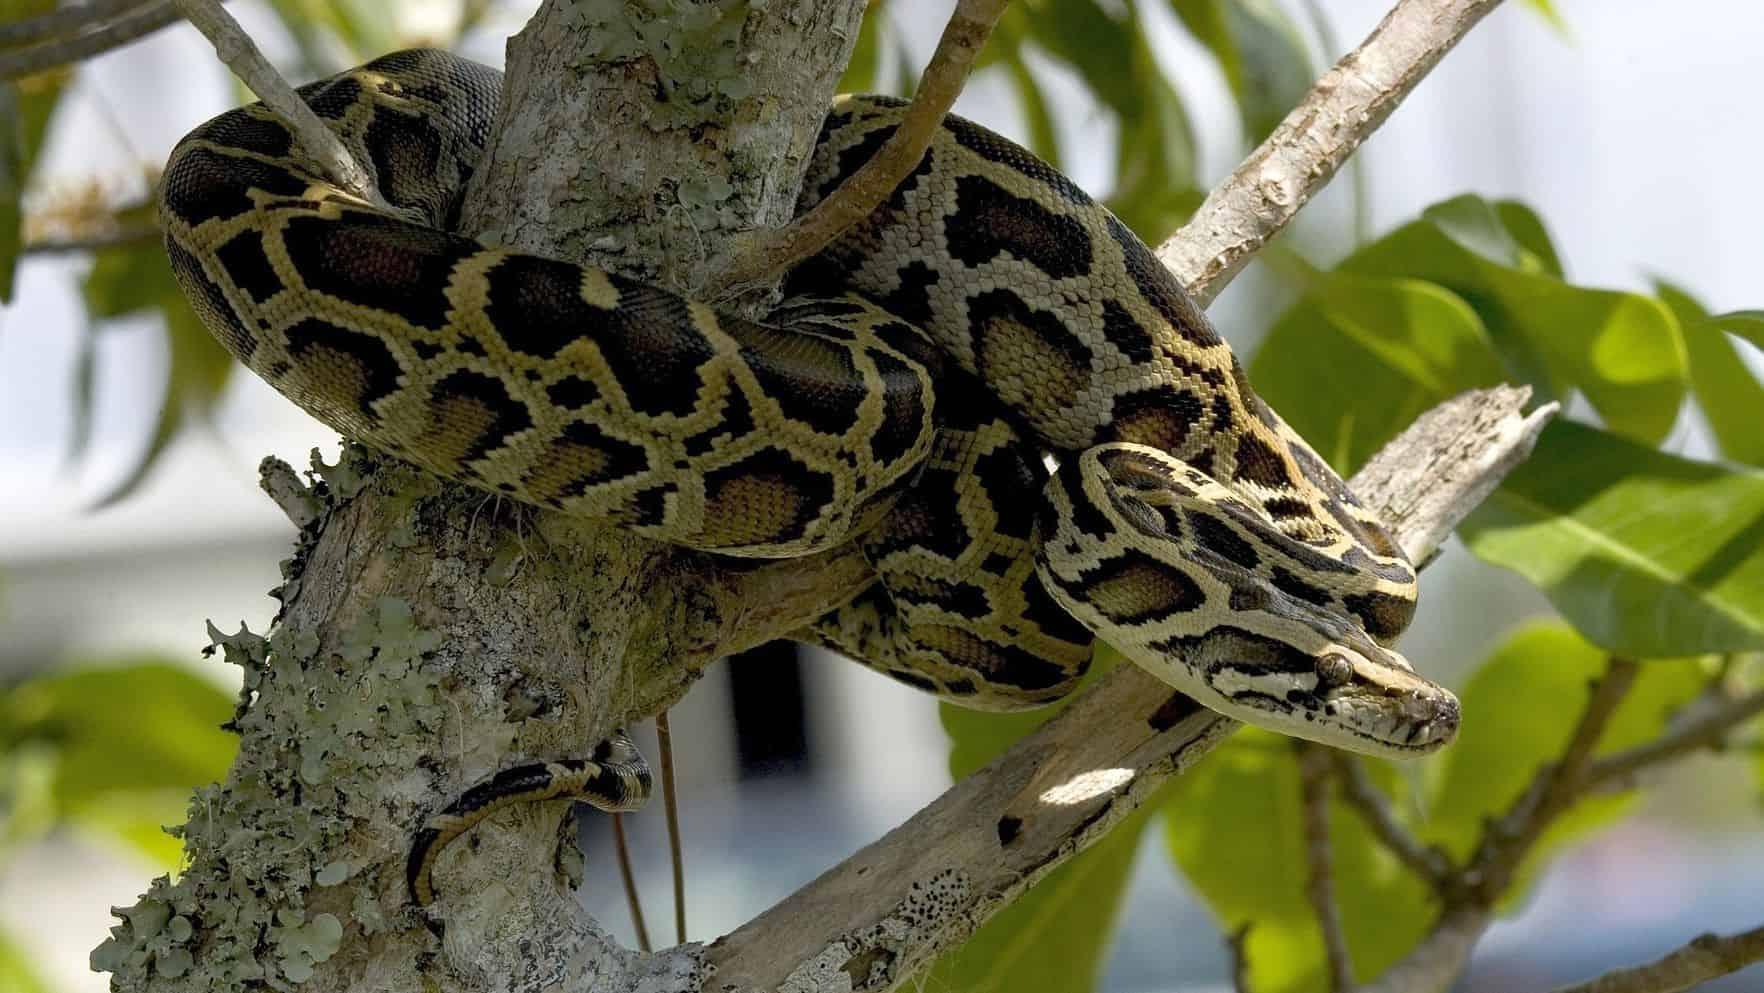 Tree-climbing Burmese python